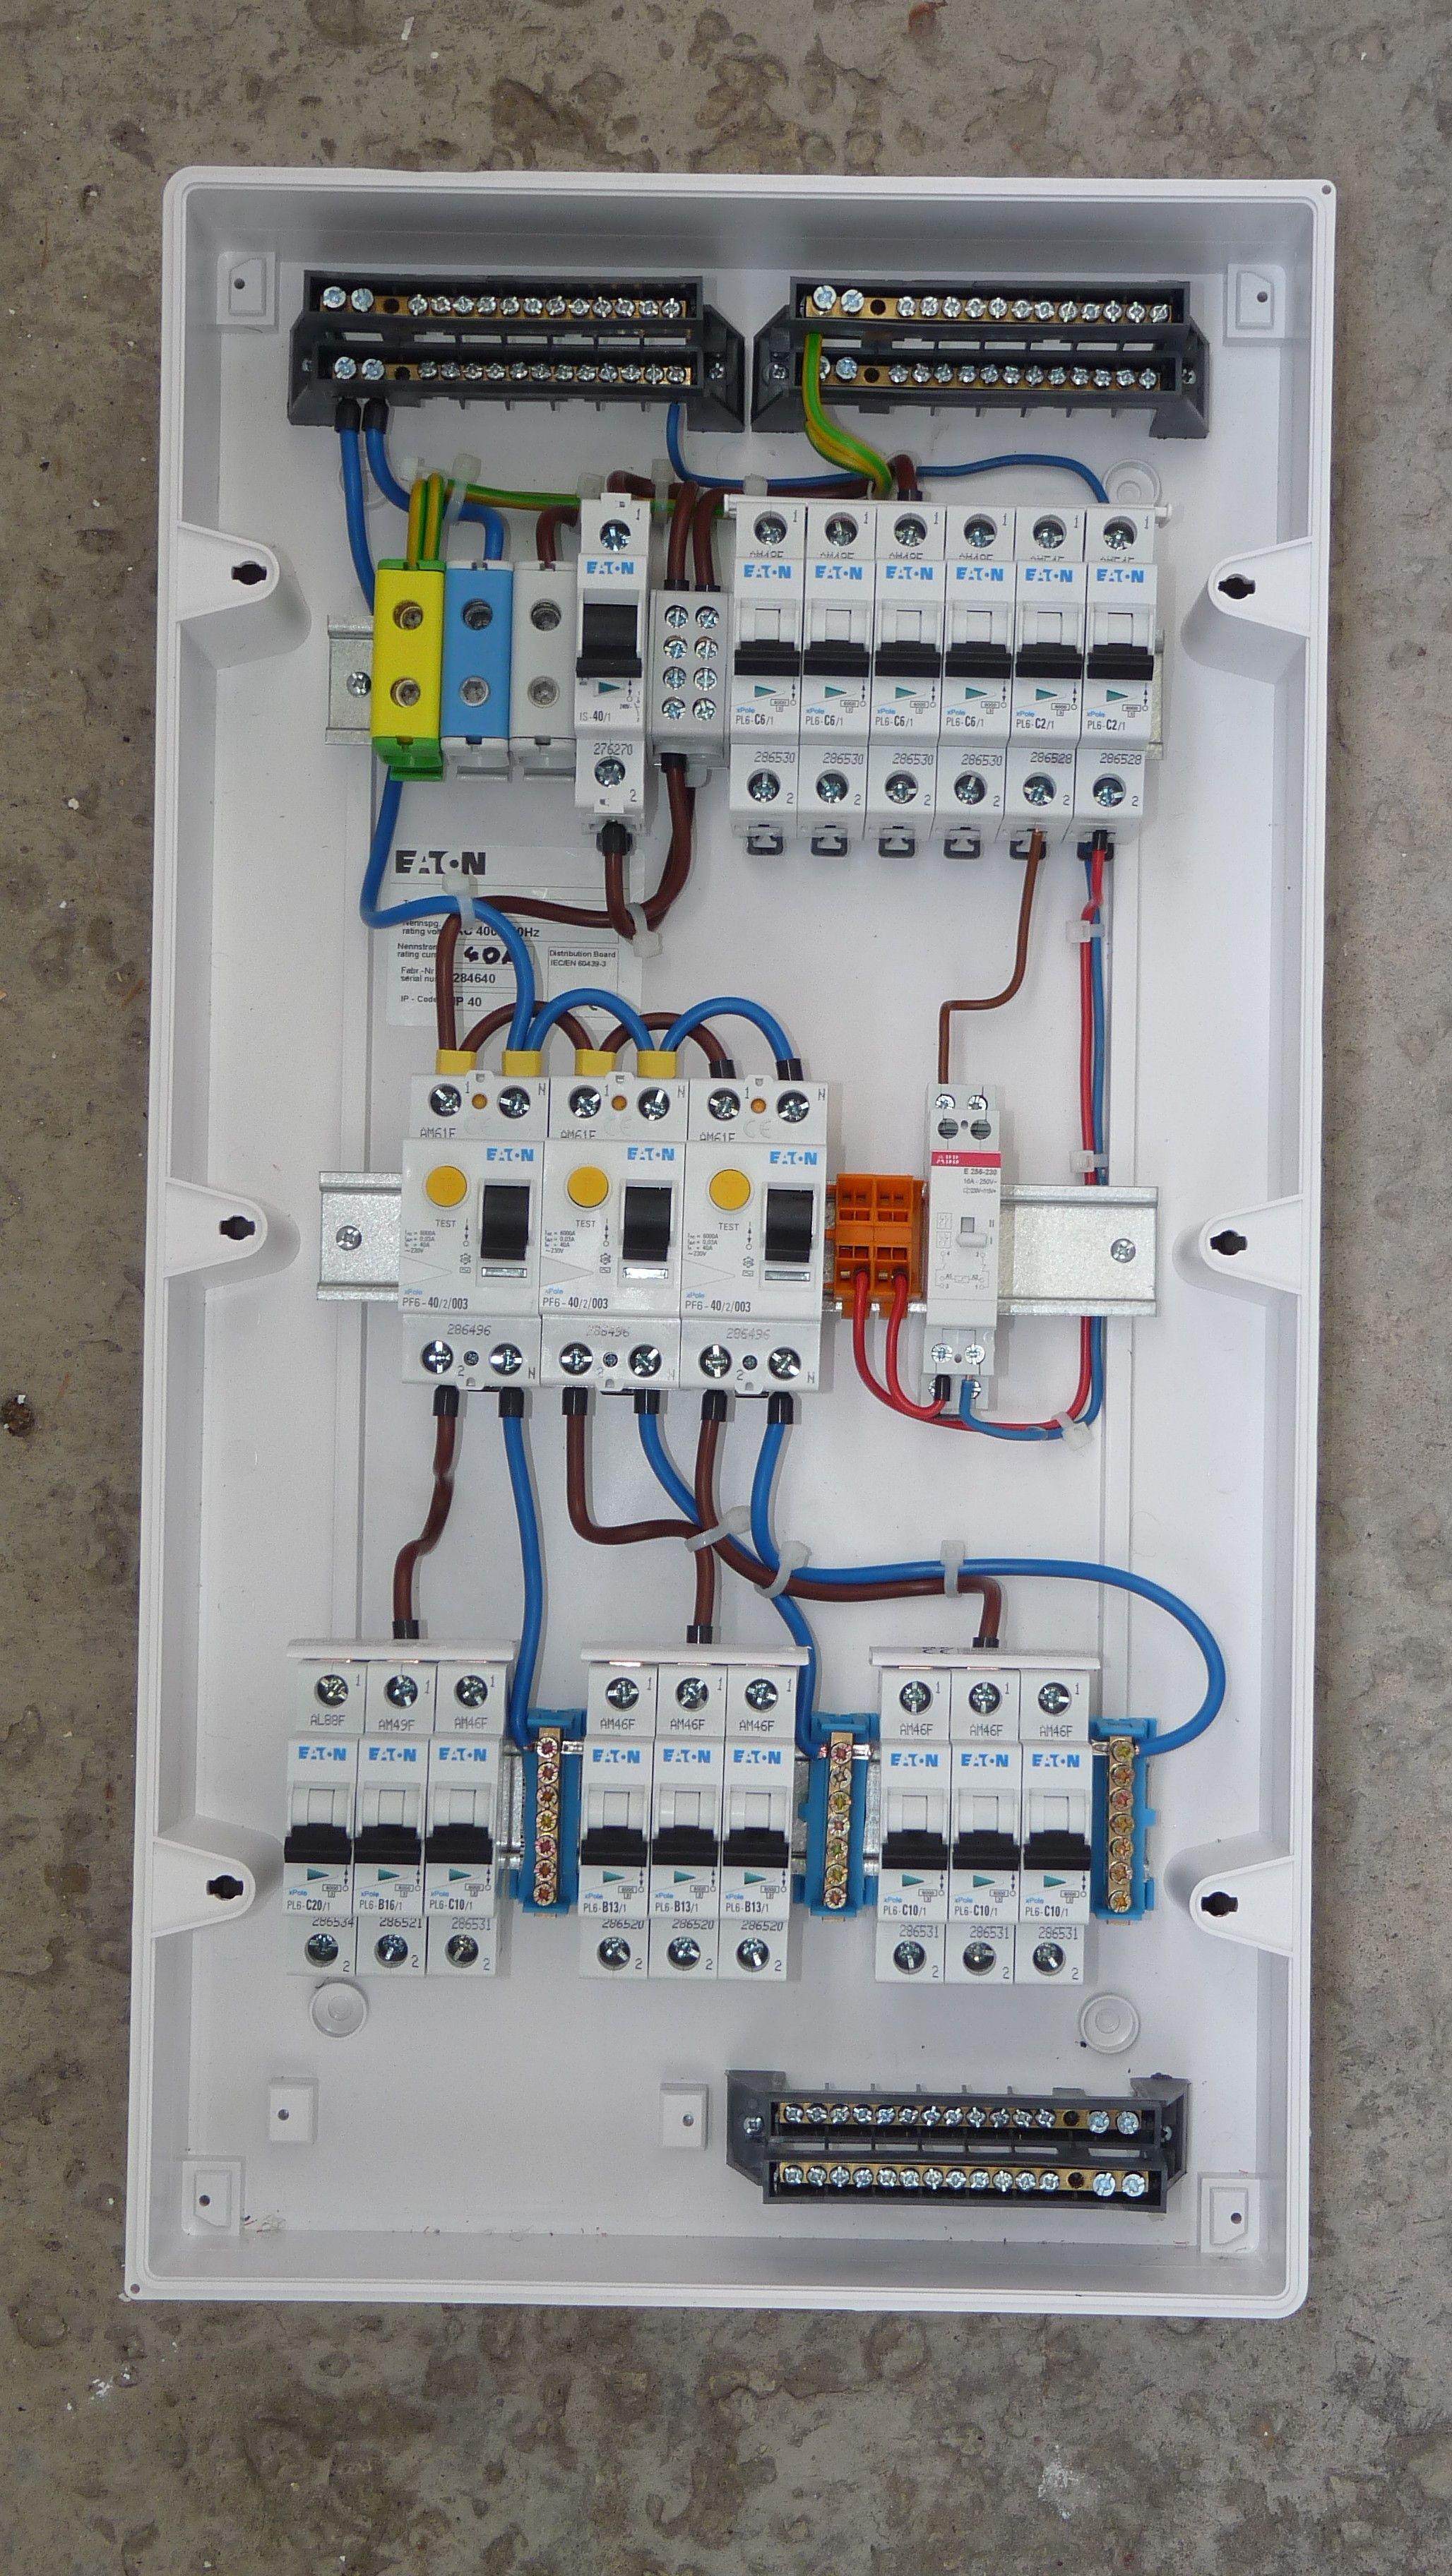 small resolution of electrical consumer unit wiring diagram diagram diagramtemplate diagramsample